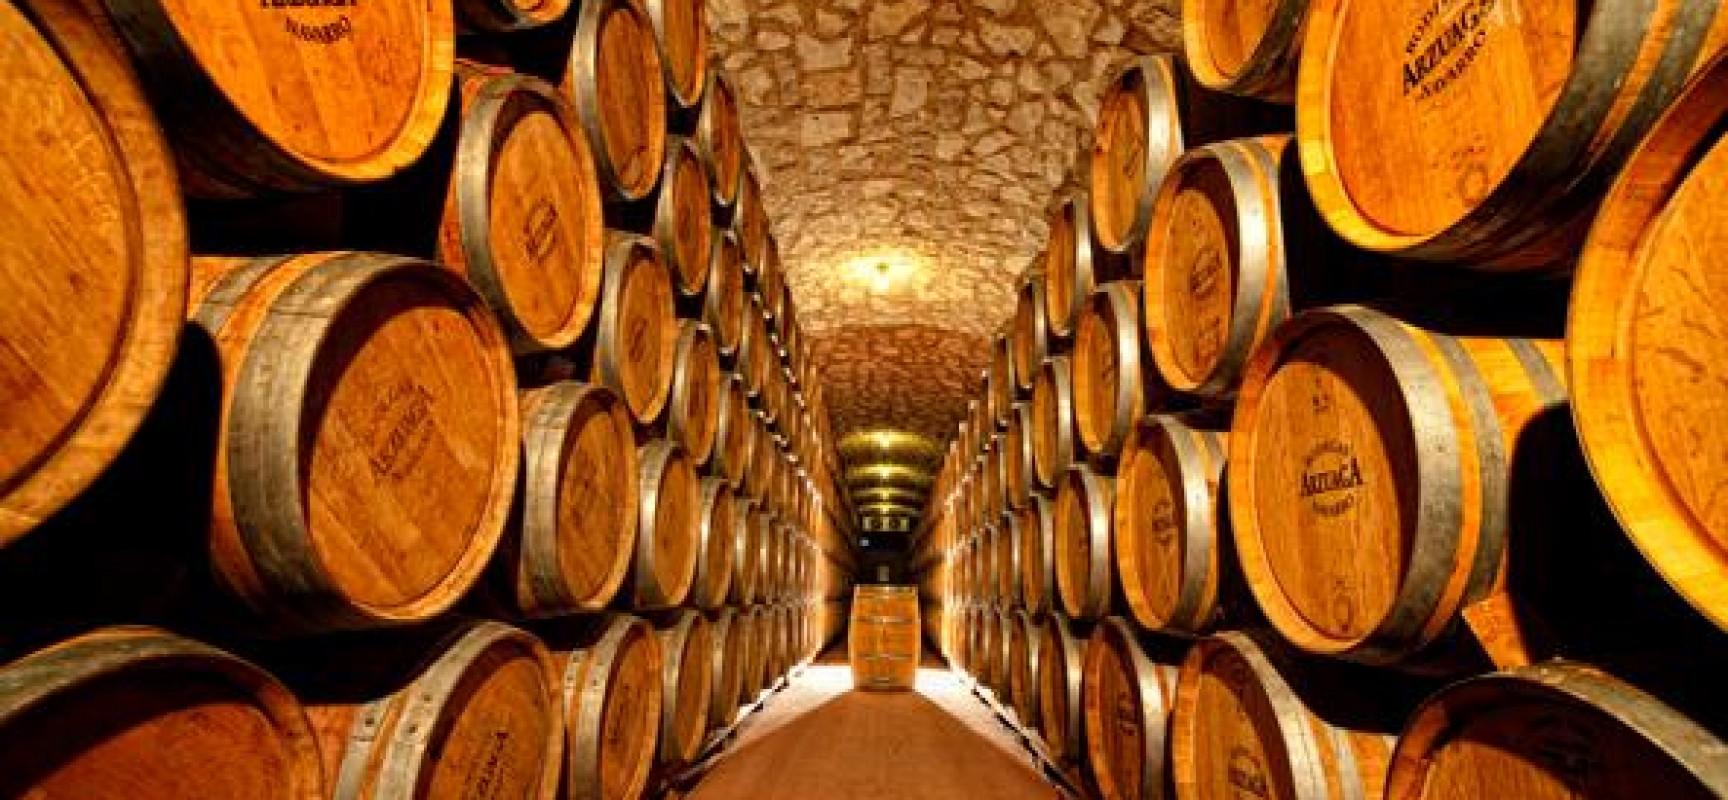 Visita a las bodegas arzuaga destino castilla y le n - Bodegas de vino en valencia ...